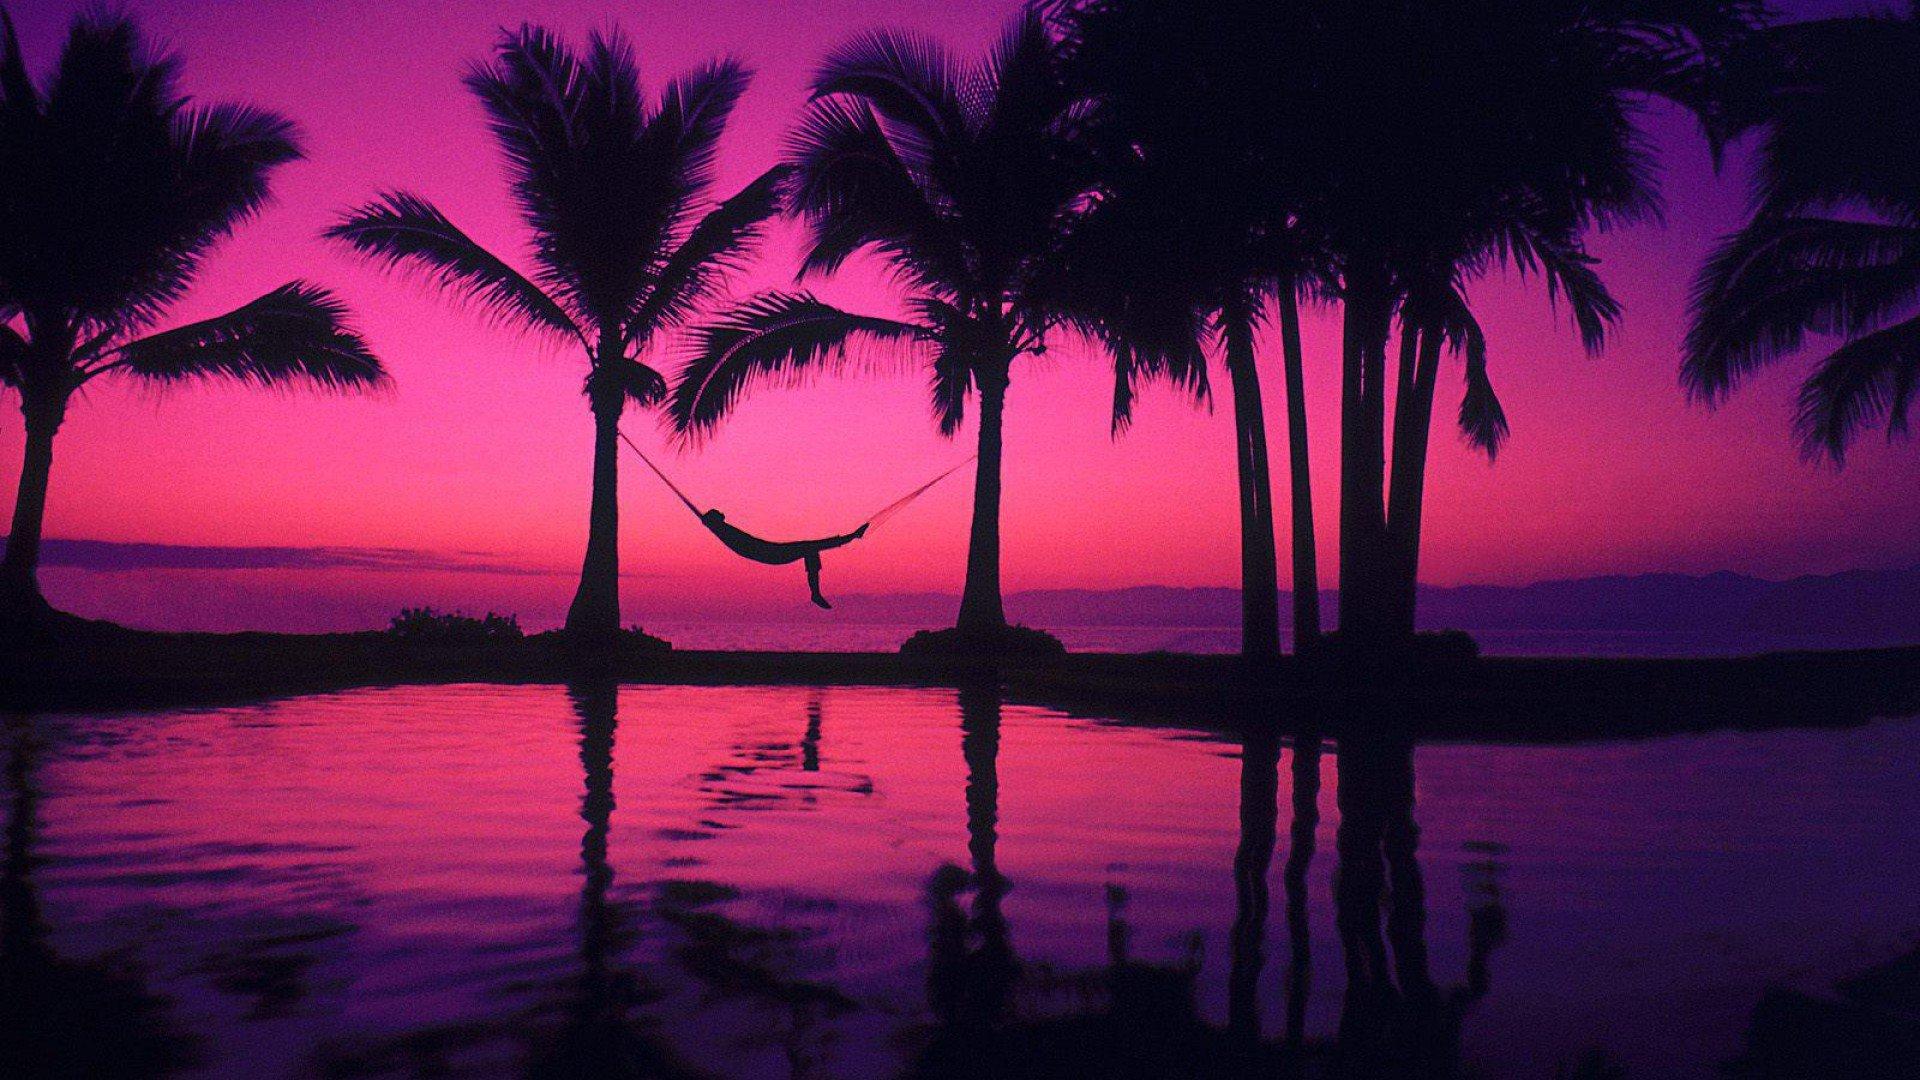 wallpaper-purple-cool-beach-flowers